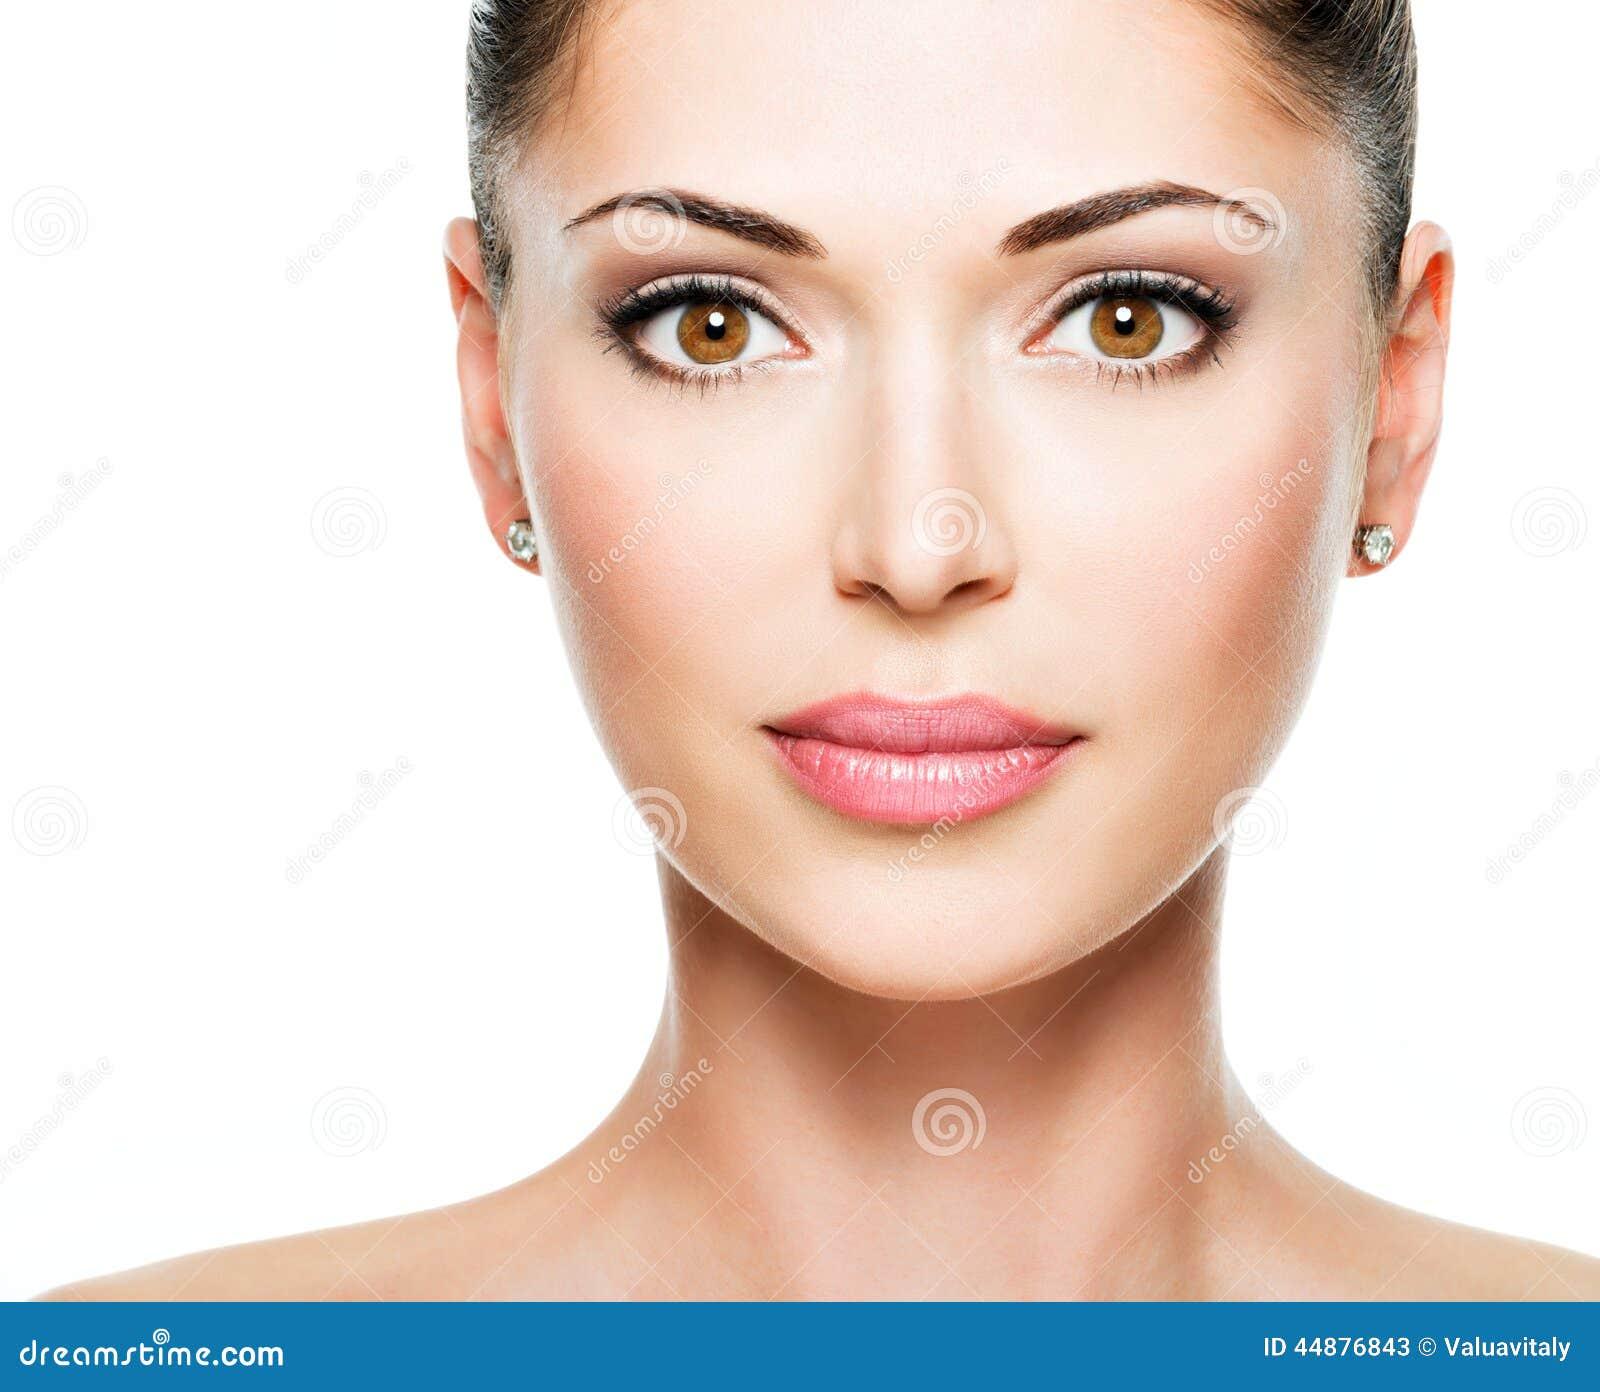 Beautiful Adult Women 24